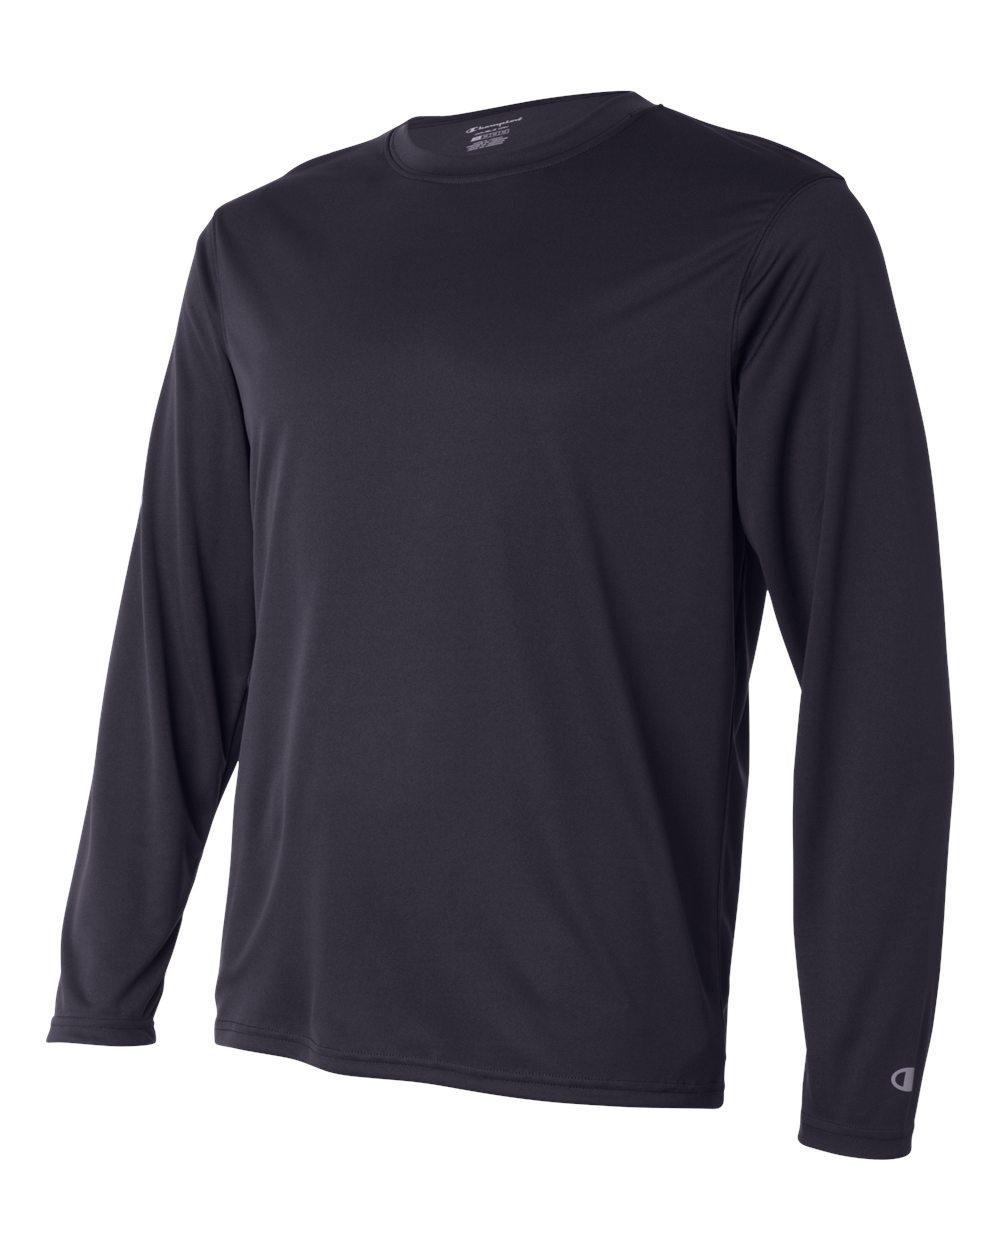 Champion-Men-039-s-Double-Dry-4-1-oz-Long-Sleeve-Interlock-T-Shirt-CW26-XS-3XL thumbnail 13